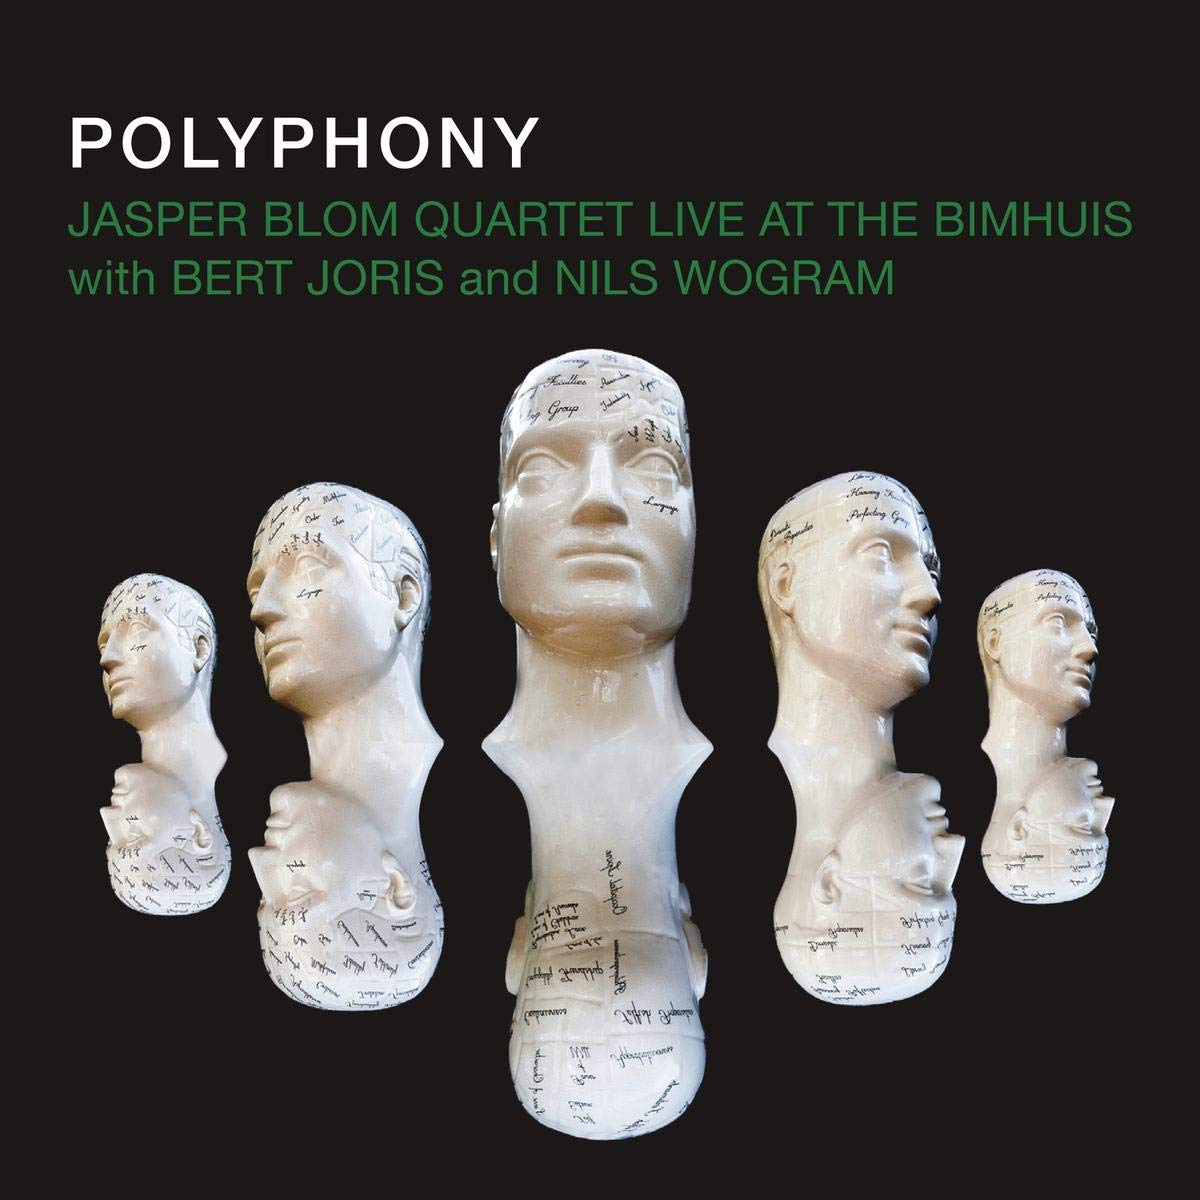 Jasper Bloom Quartet - Polyphony